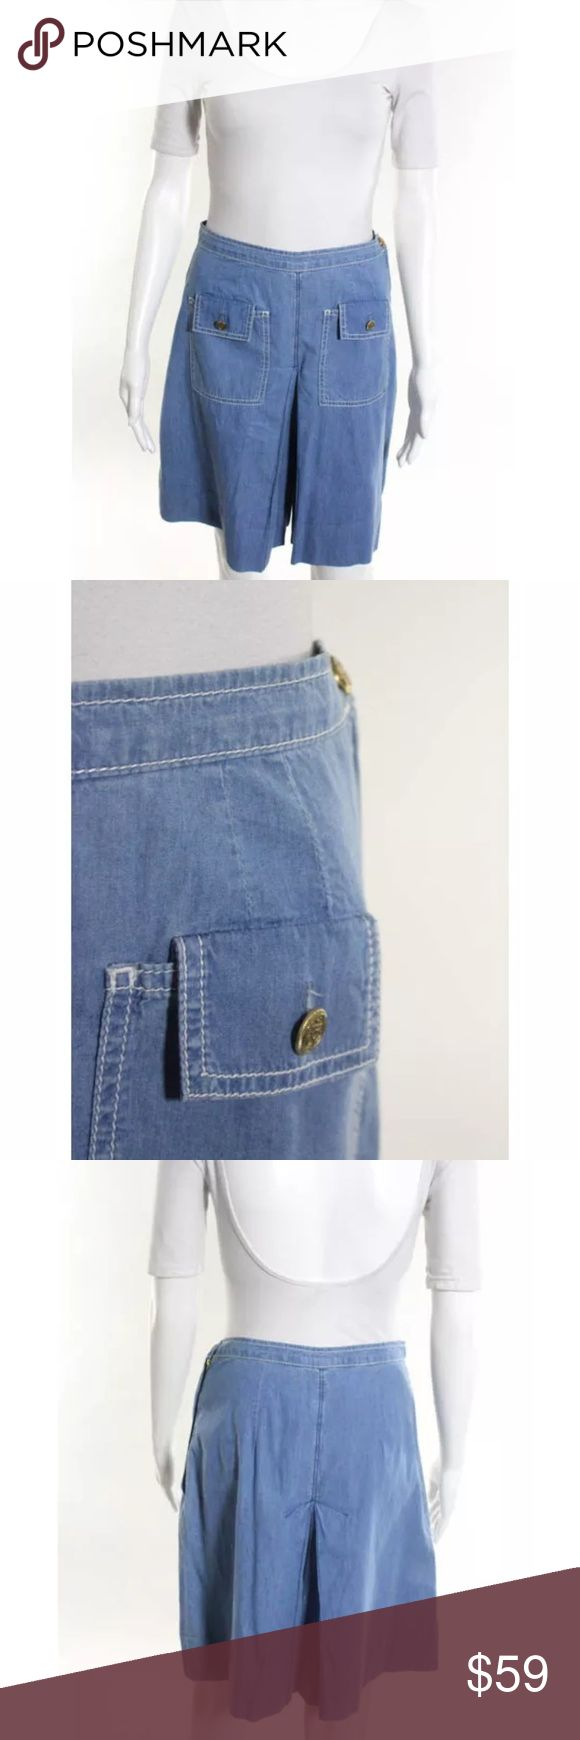 Whistles gaucho shorts Sz 6 blue Blue chambray denim gaucho shorts Whistles Shorts Bermudas